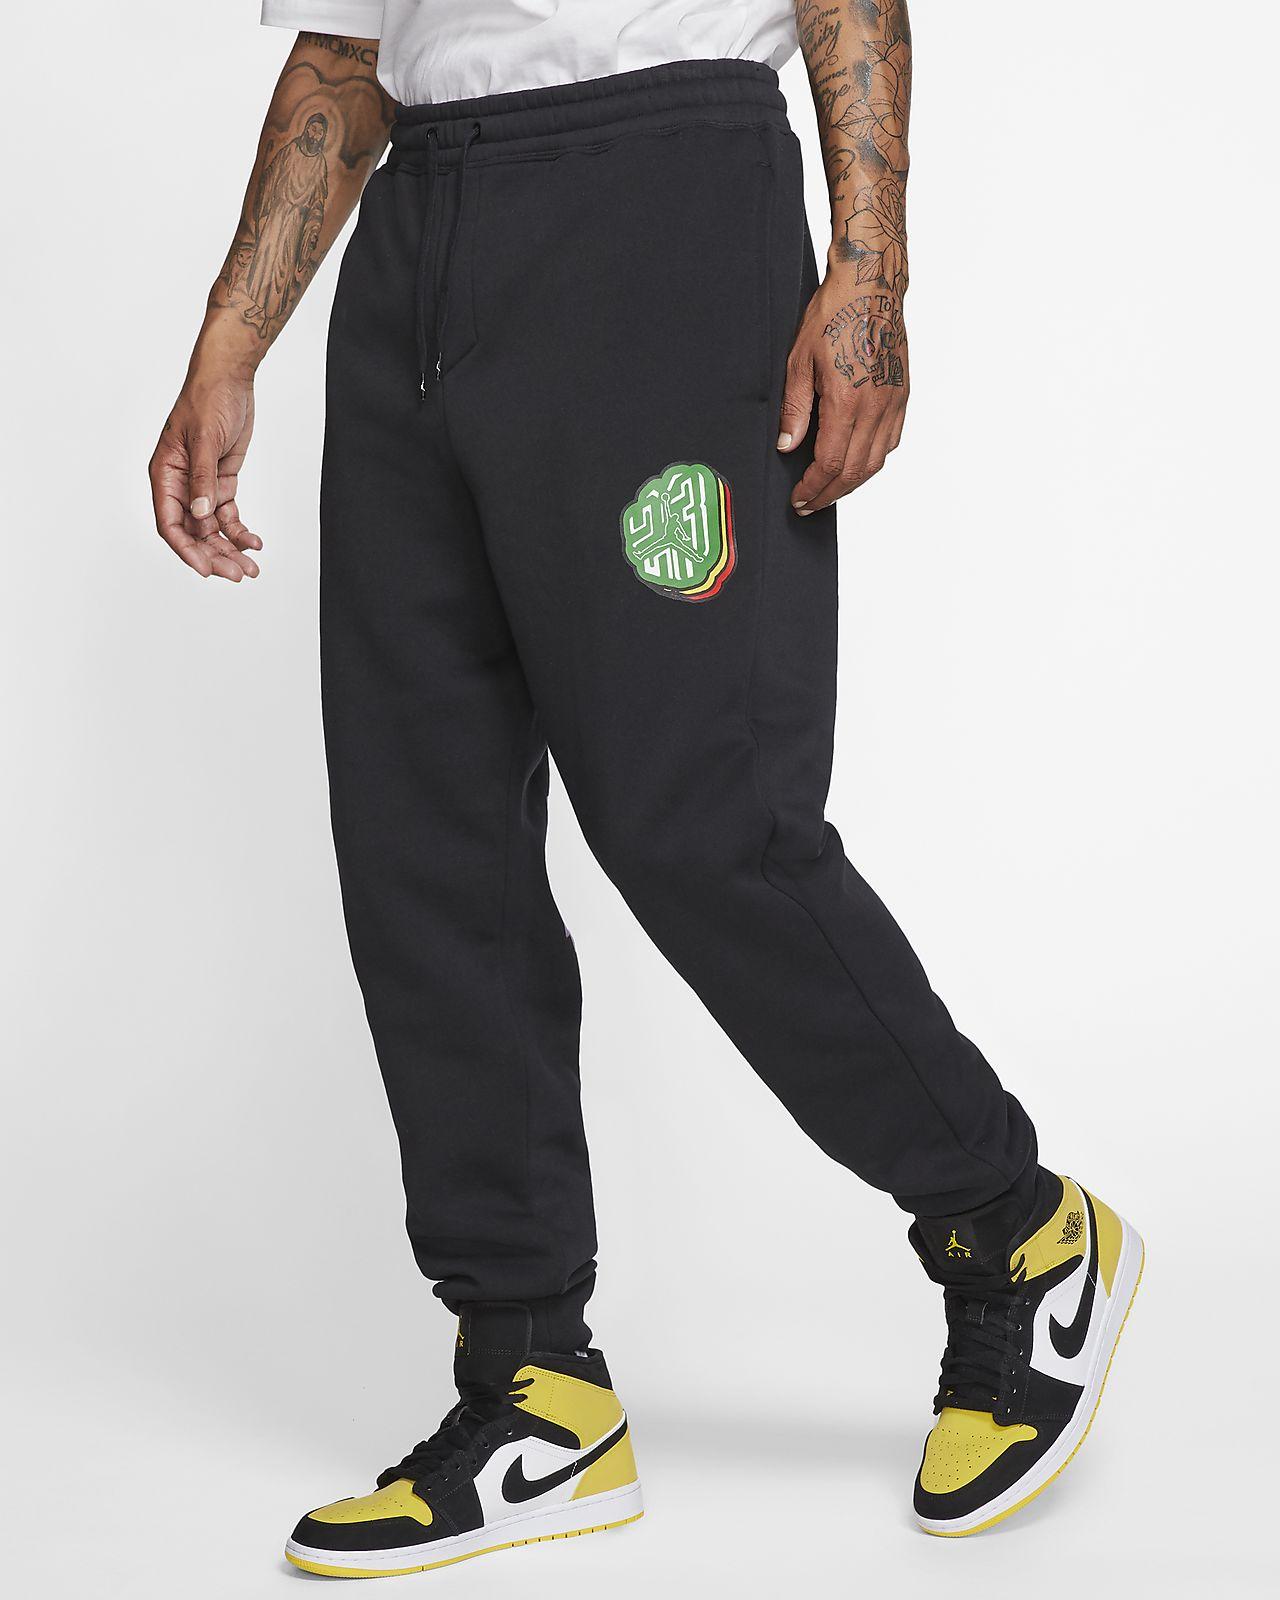 Jordan Jumpman Sticker Pantalons de teixit Fleece - Home